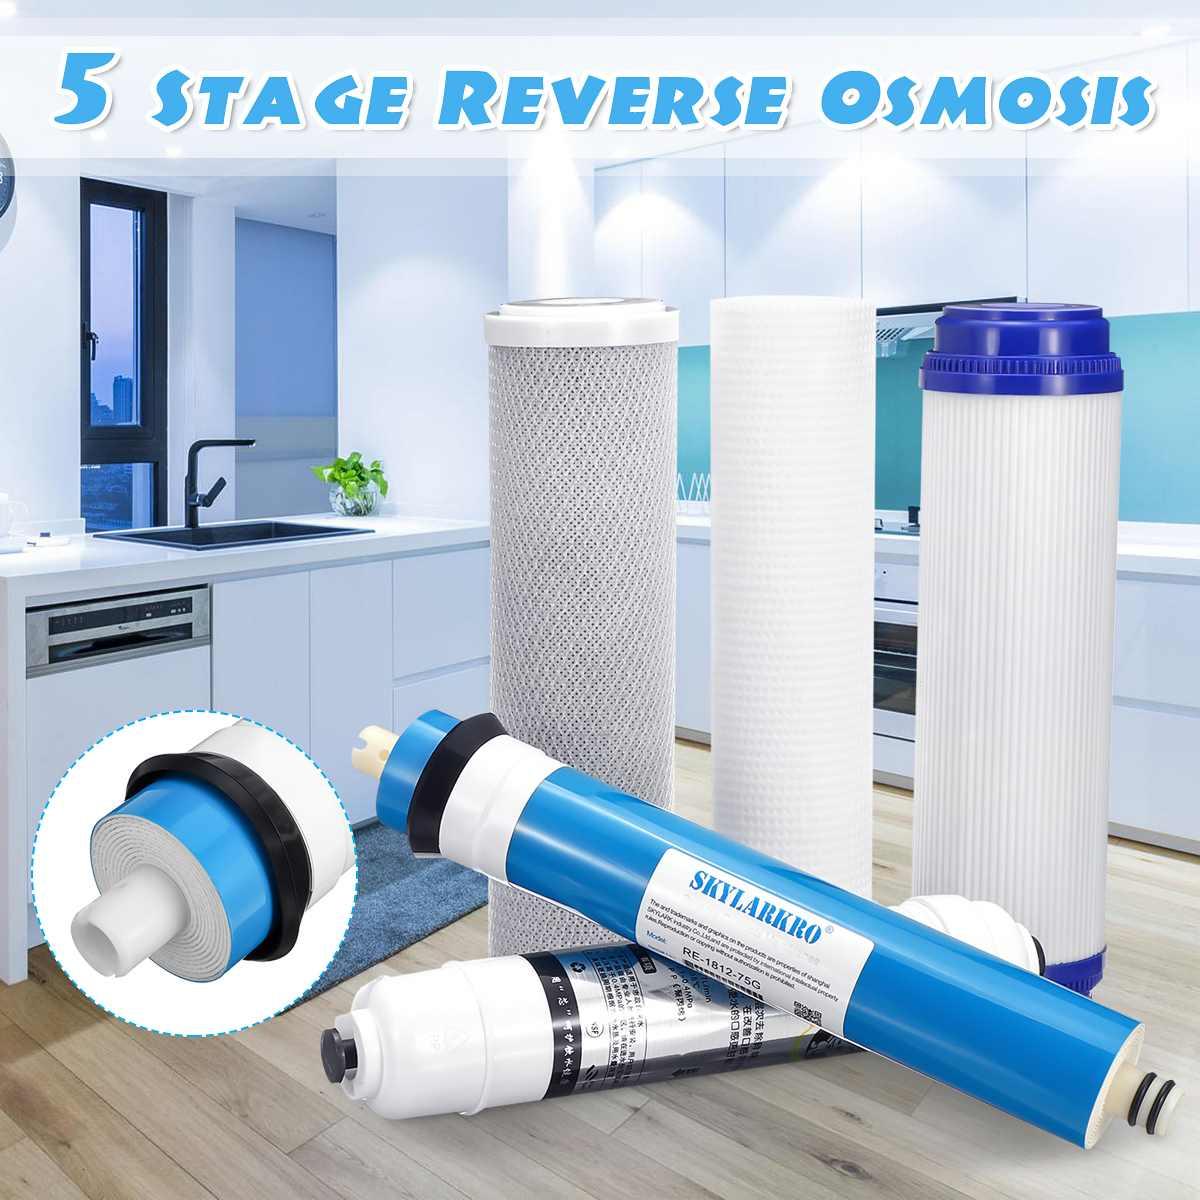 5 Osmosis inversa RO agua de reemplazo Kit de filtro con 75 GPD membrana cartucho de filtro de agua purificador de agua doméstica purificador de agua